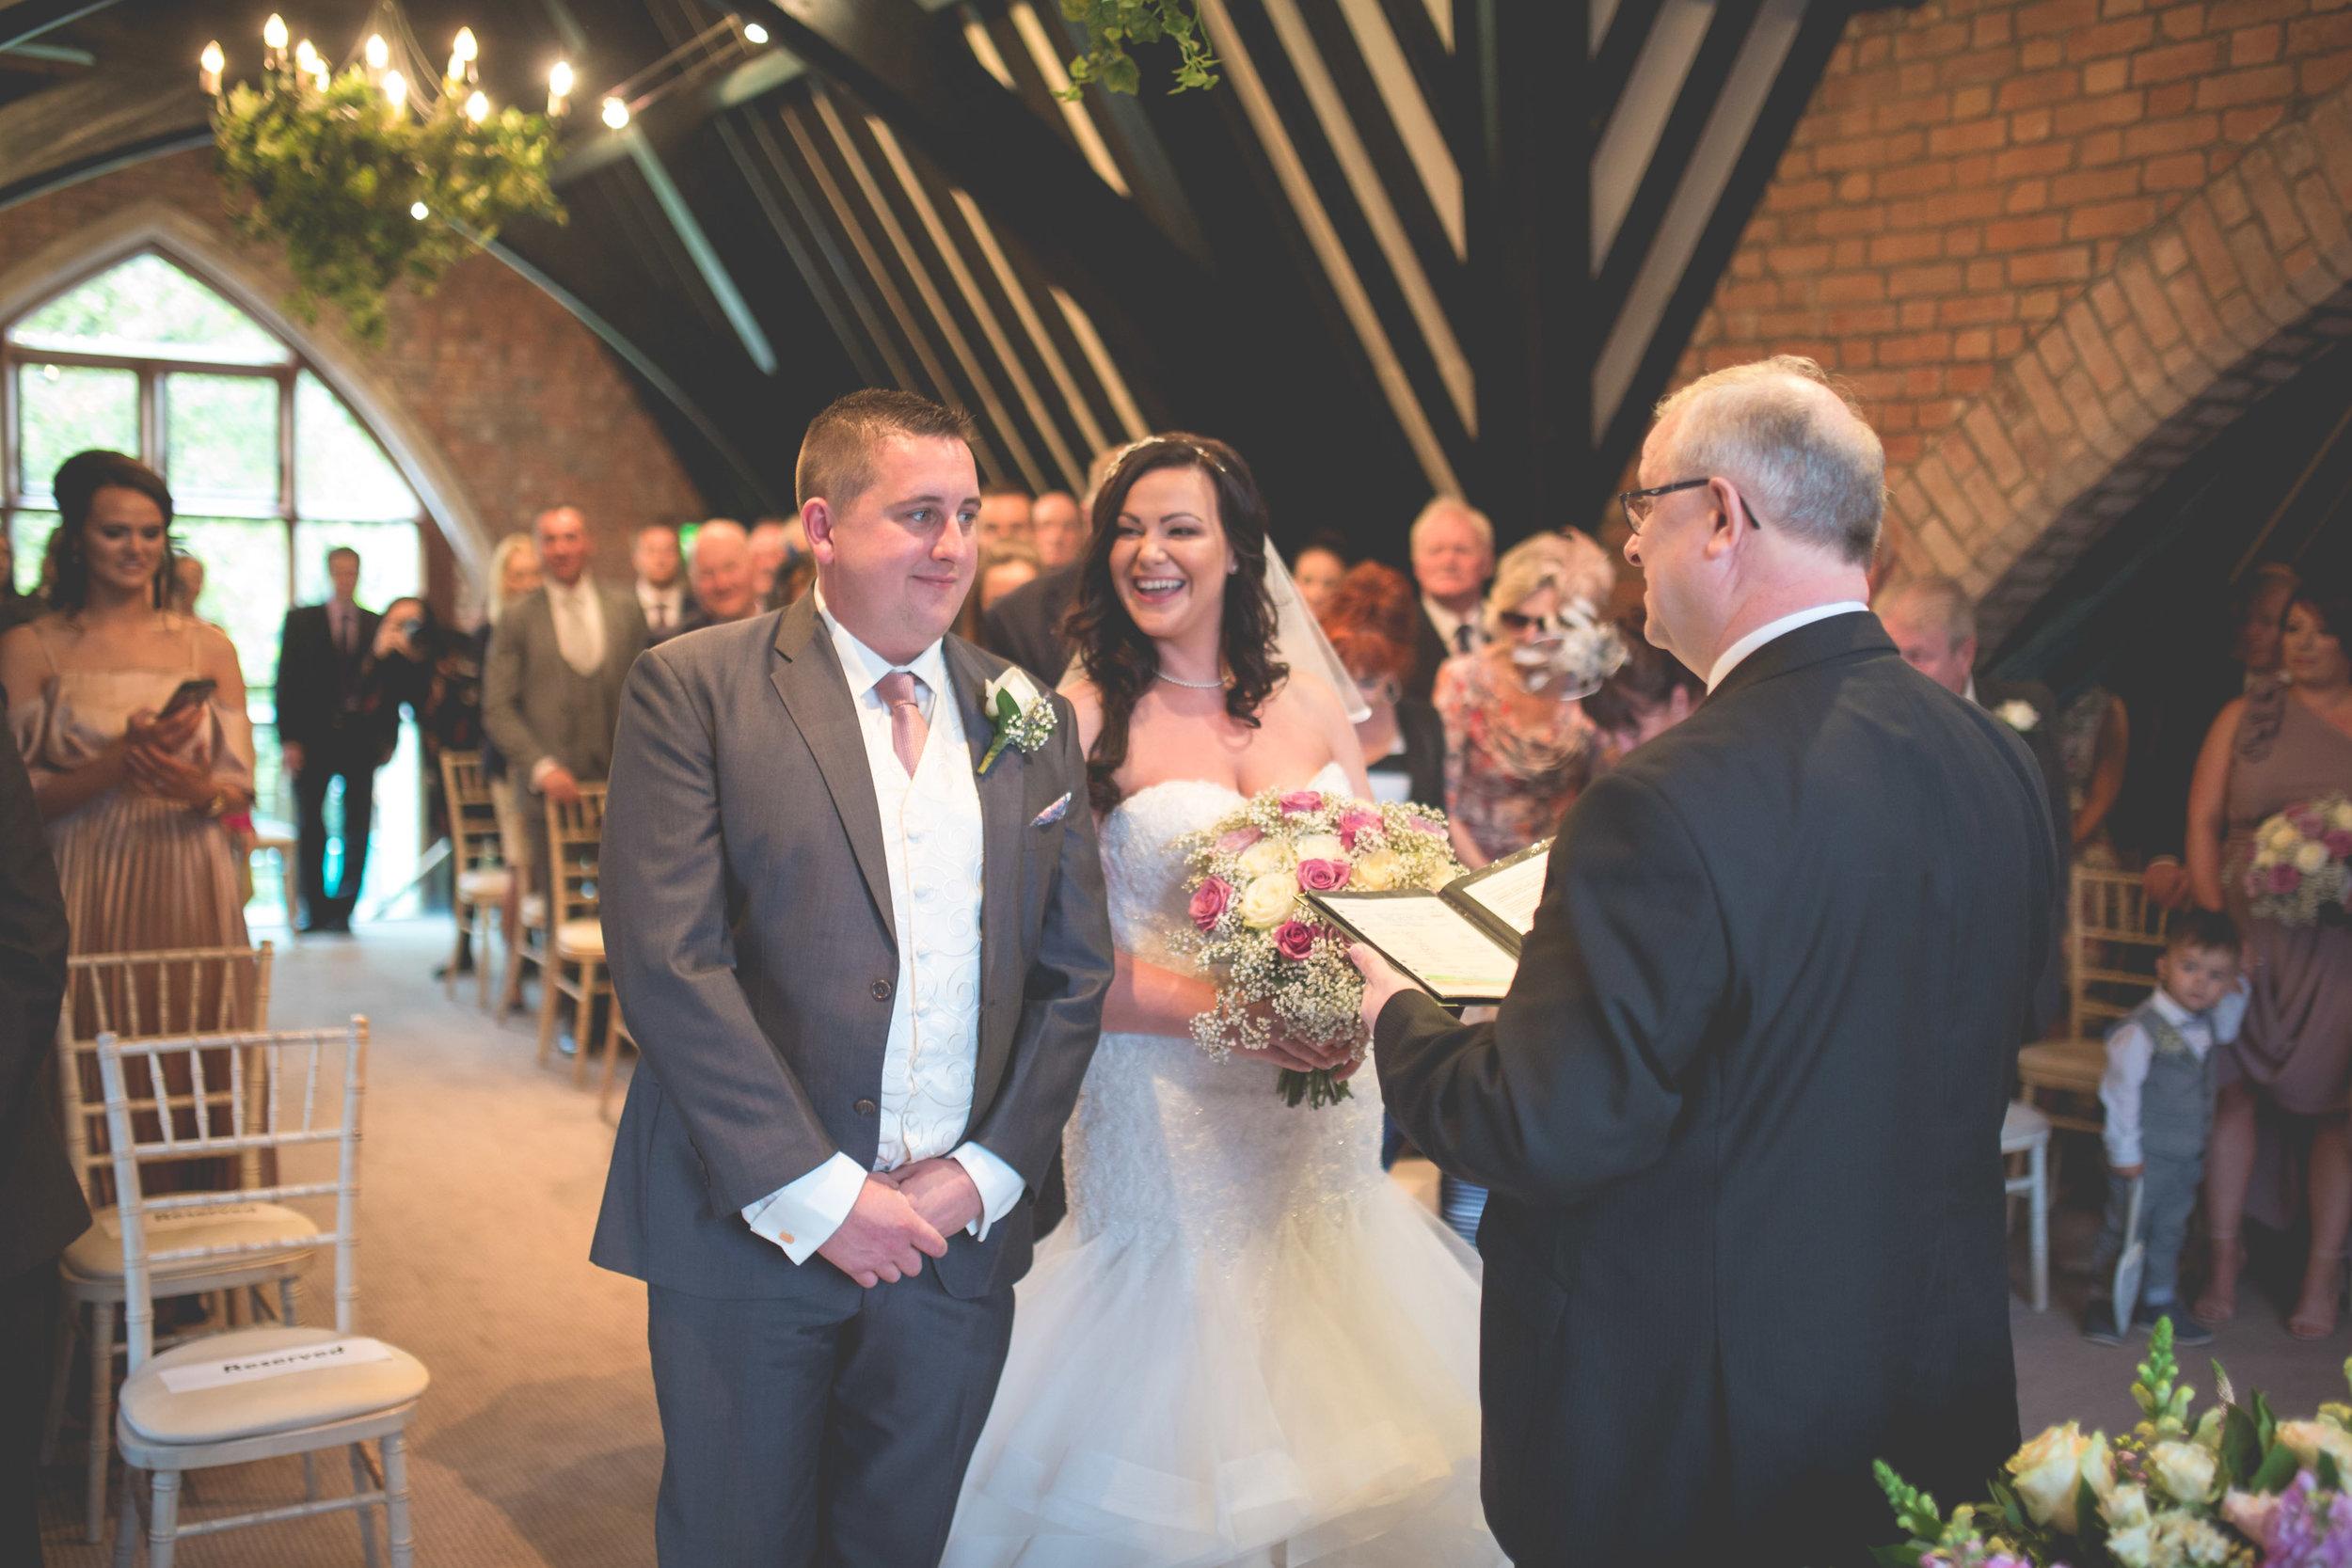 Helena & Terence - Ceremony-26.jpg